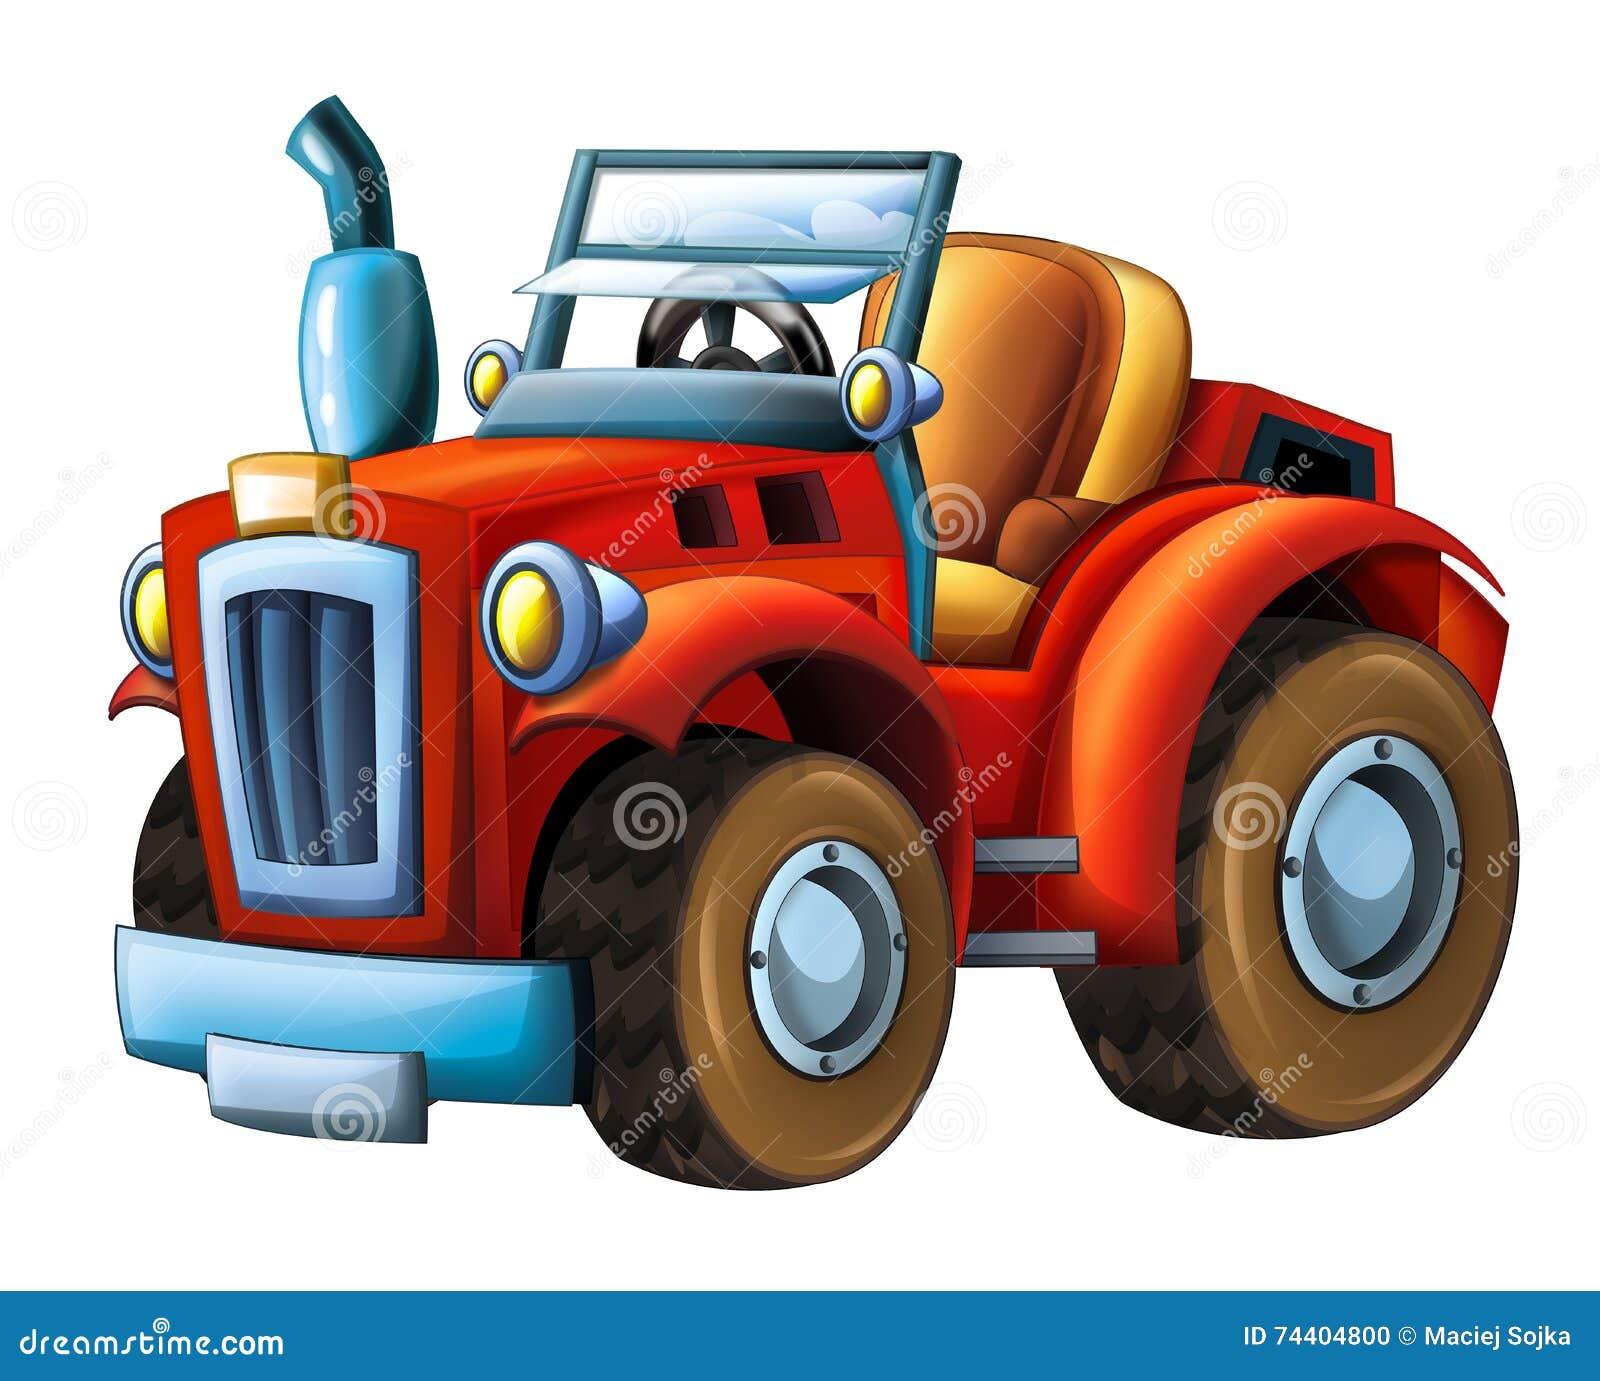 Tractor Cartoon Picker : Cartoon farm tractor stock illustration of